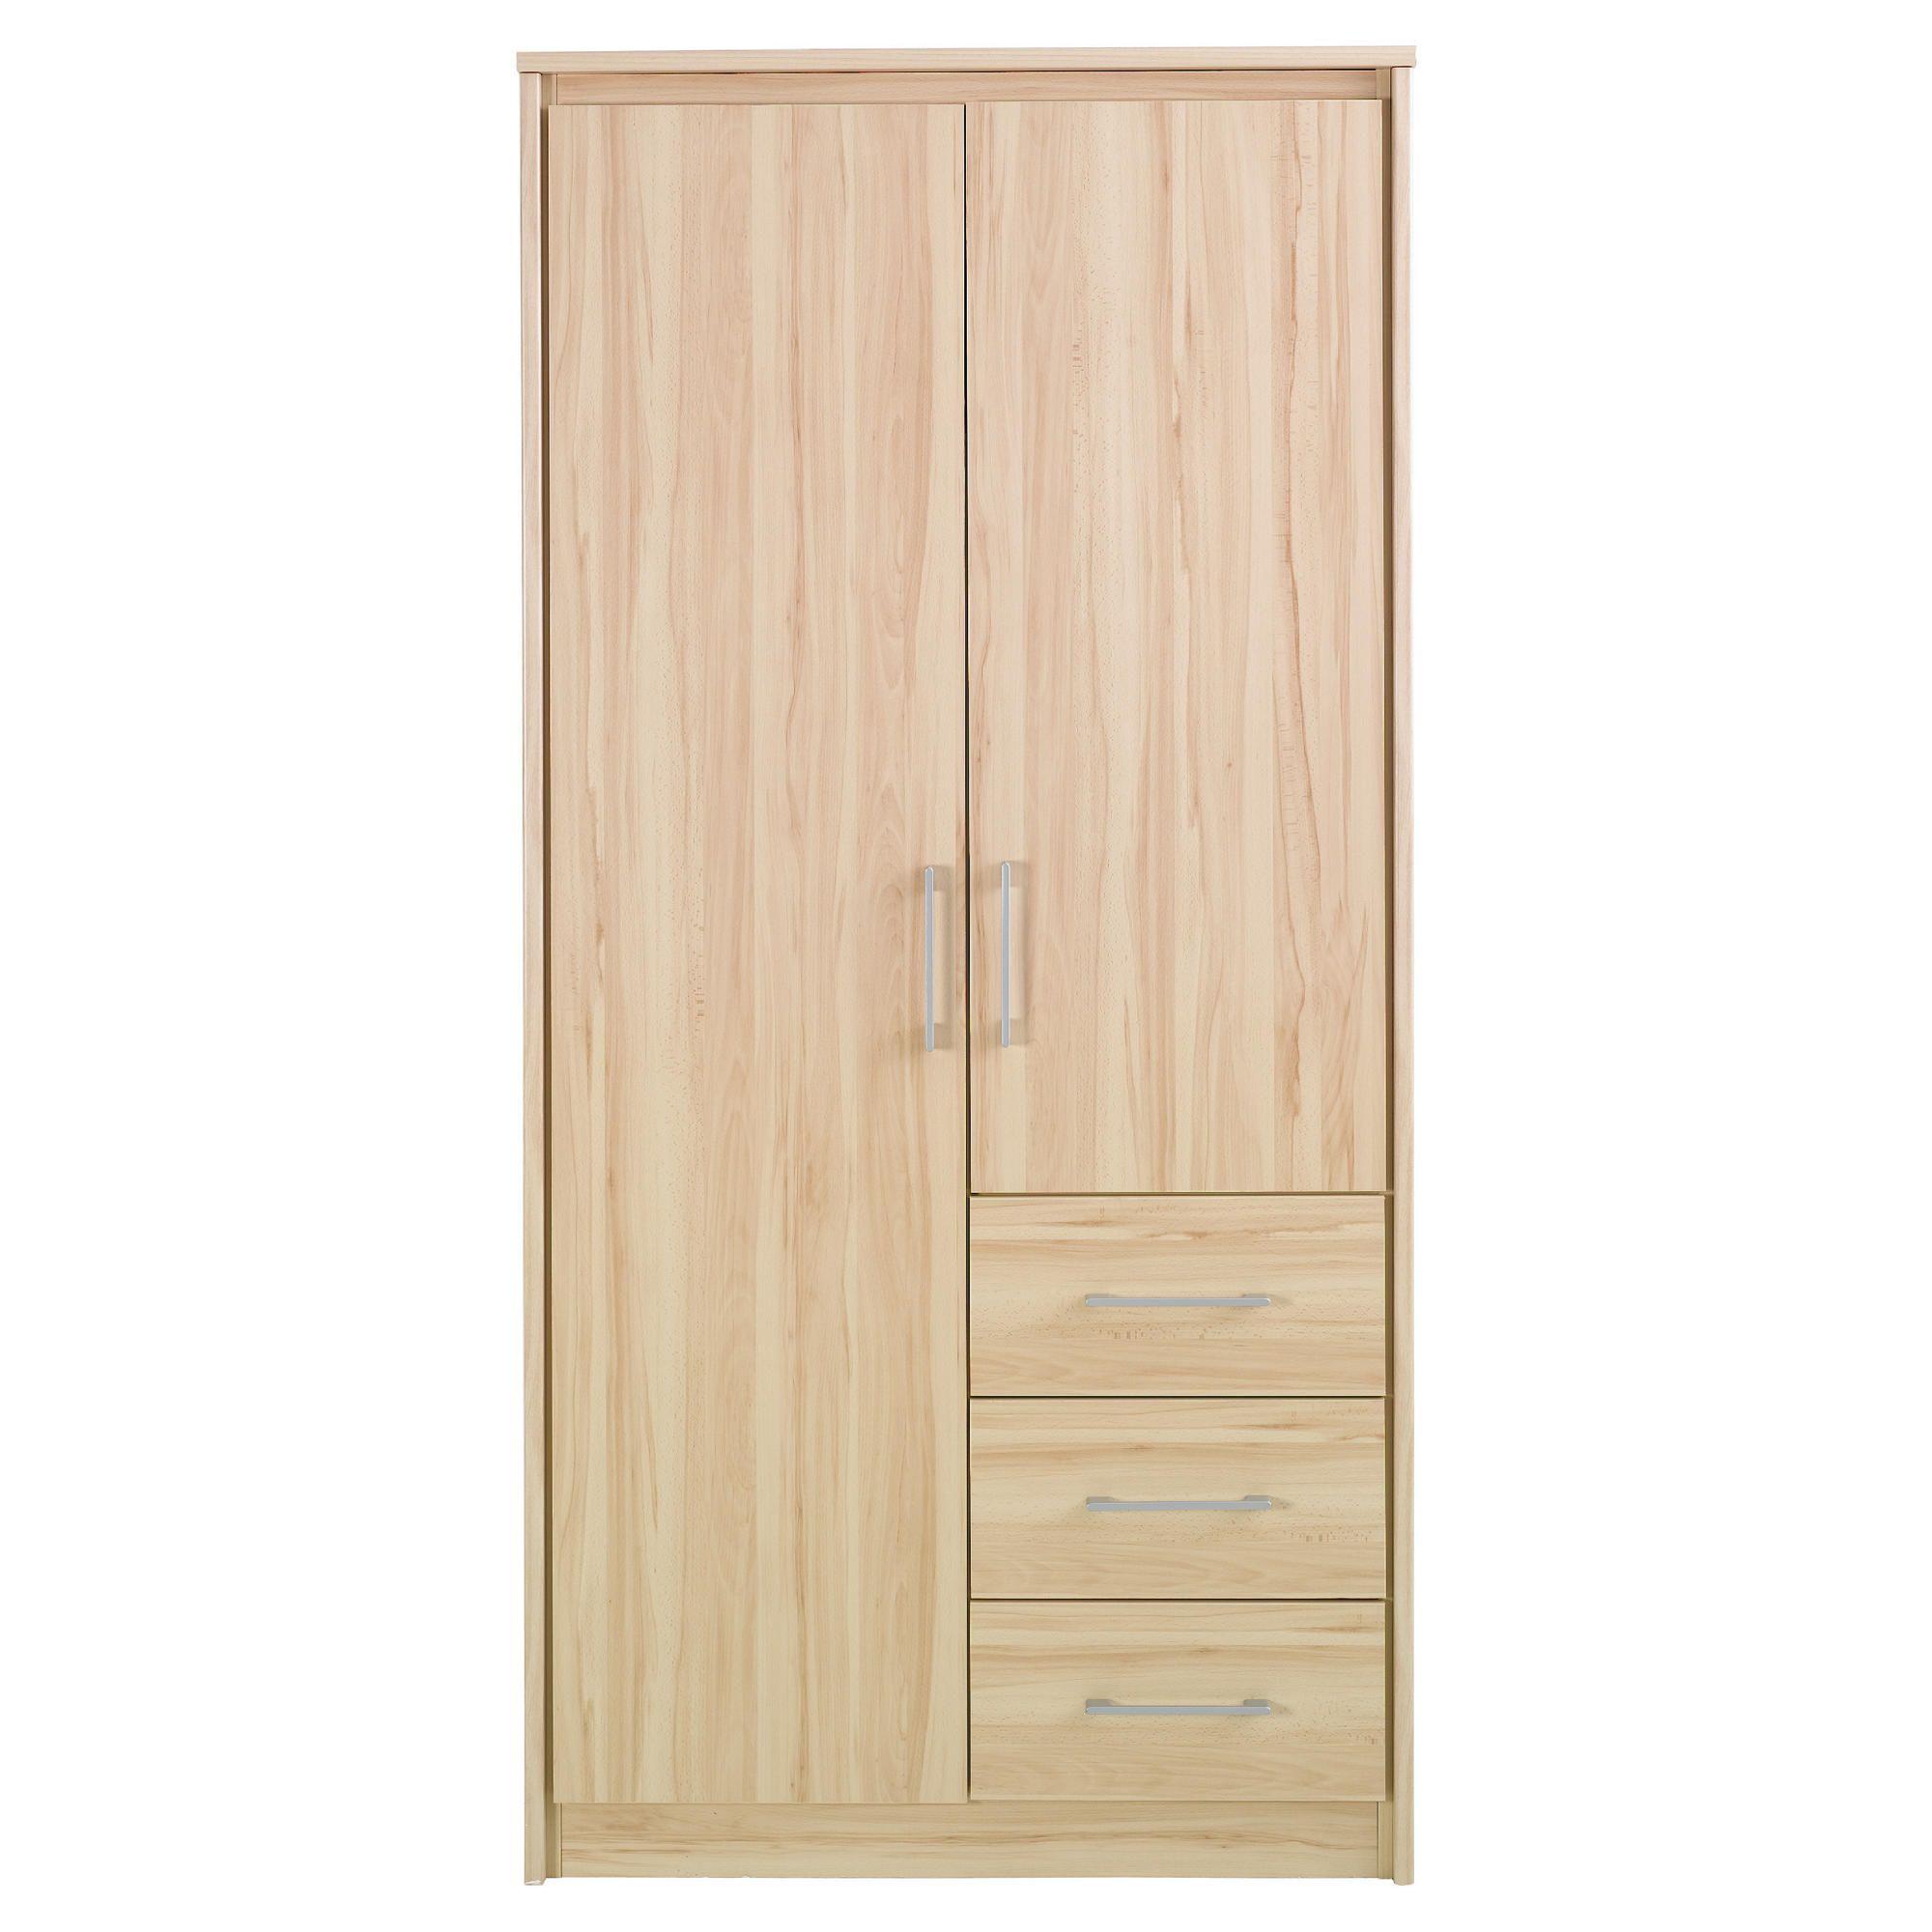 Parisot Kurt Two Door Wardrobe in Canyon Beech at Tesco Direct